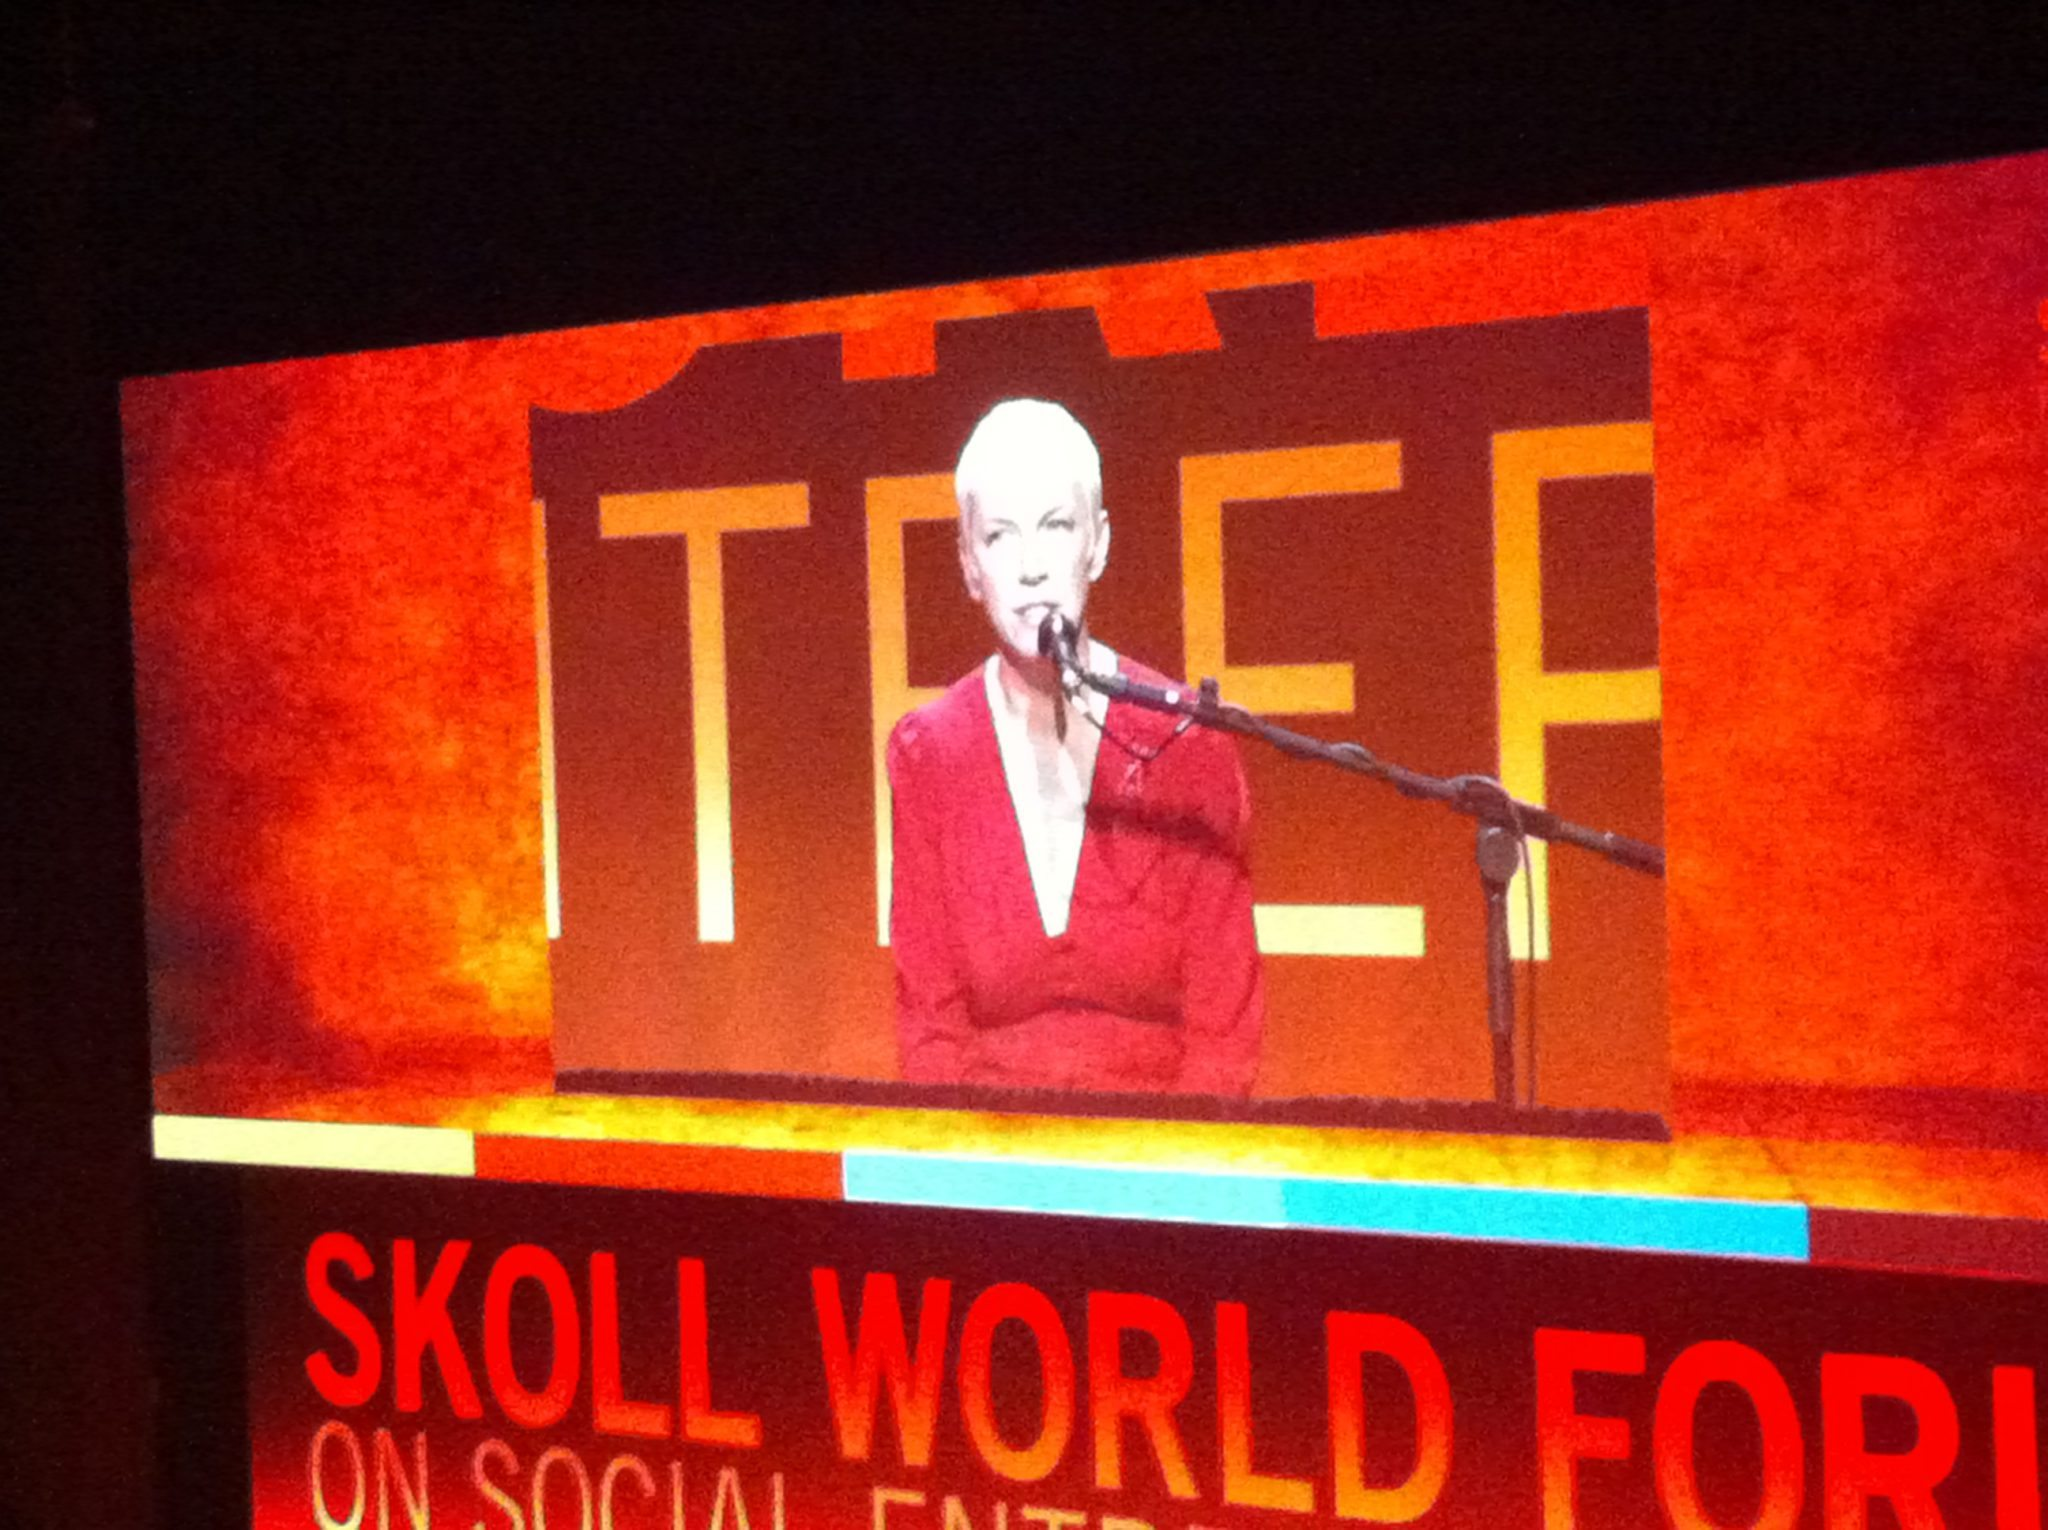 Annie Lennox Performed At The Skoll World Forum on Social Entrepreneurship In Oxford